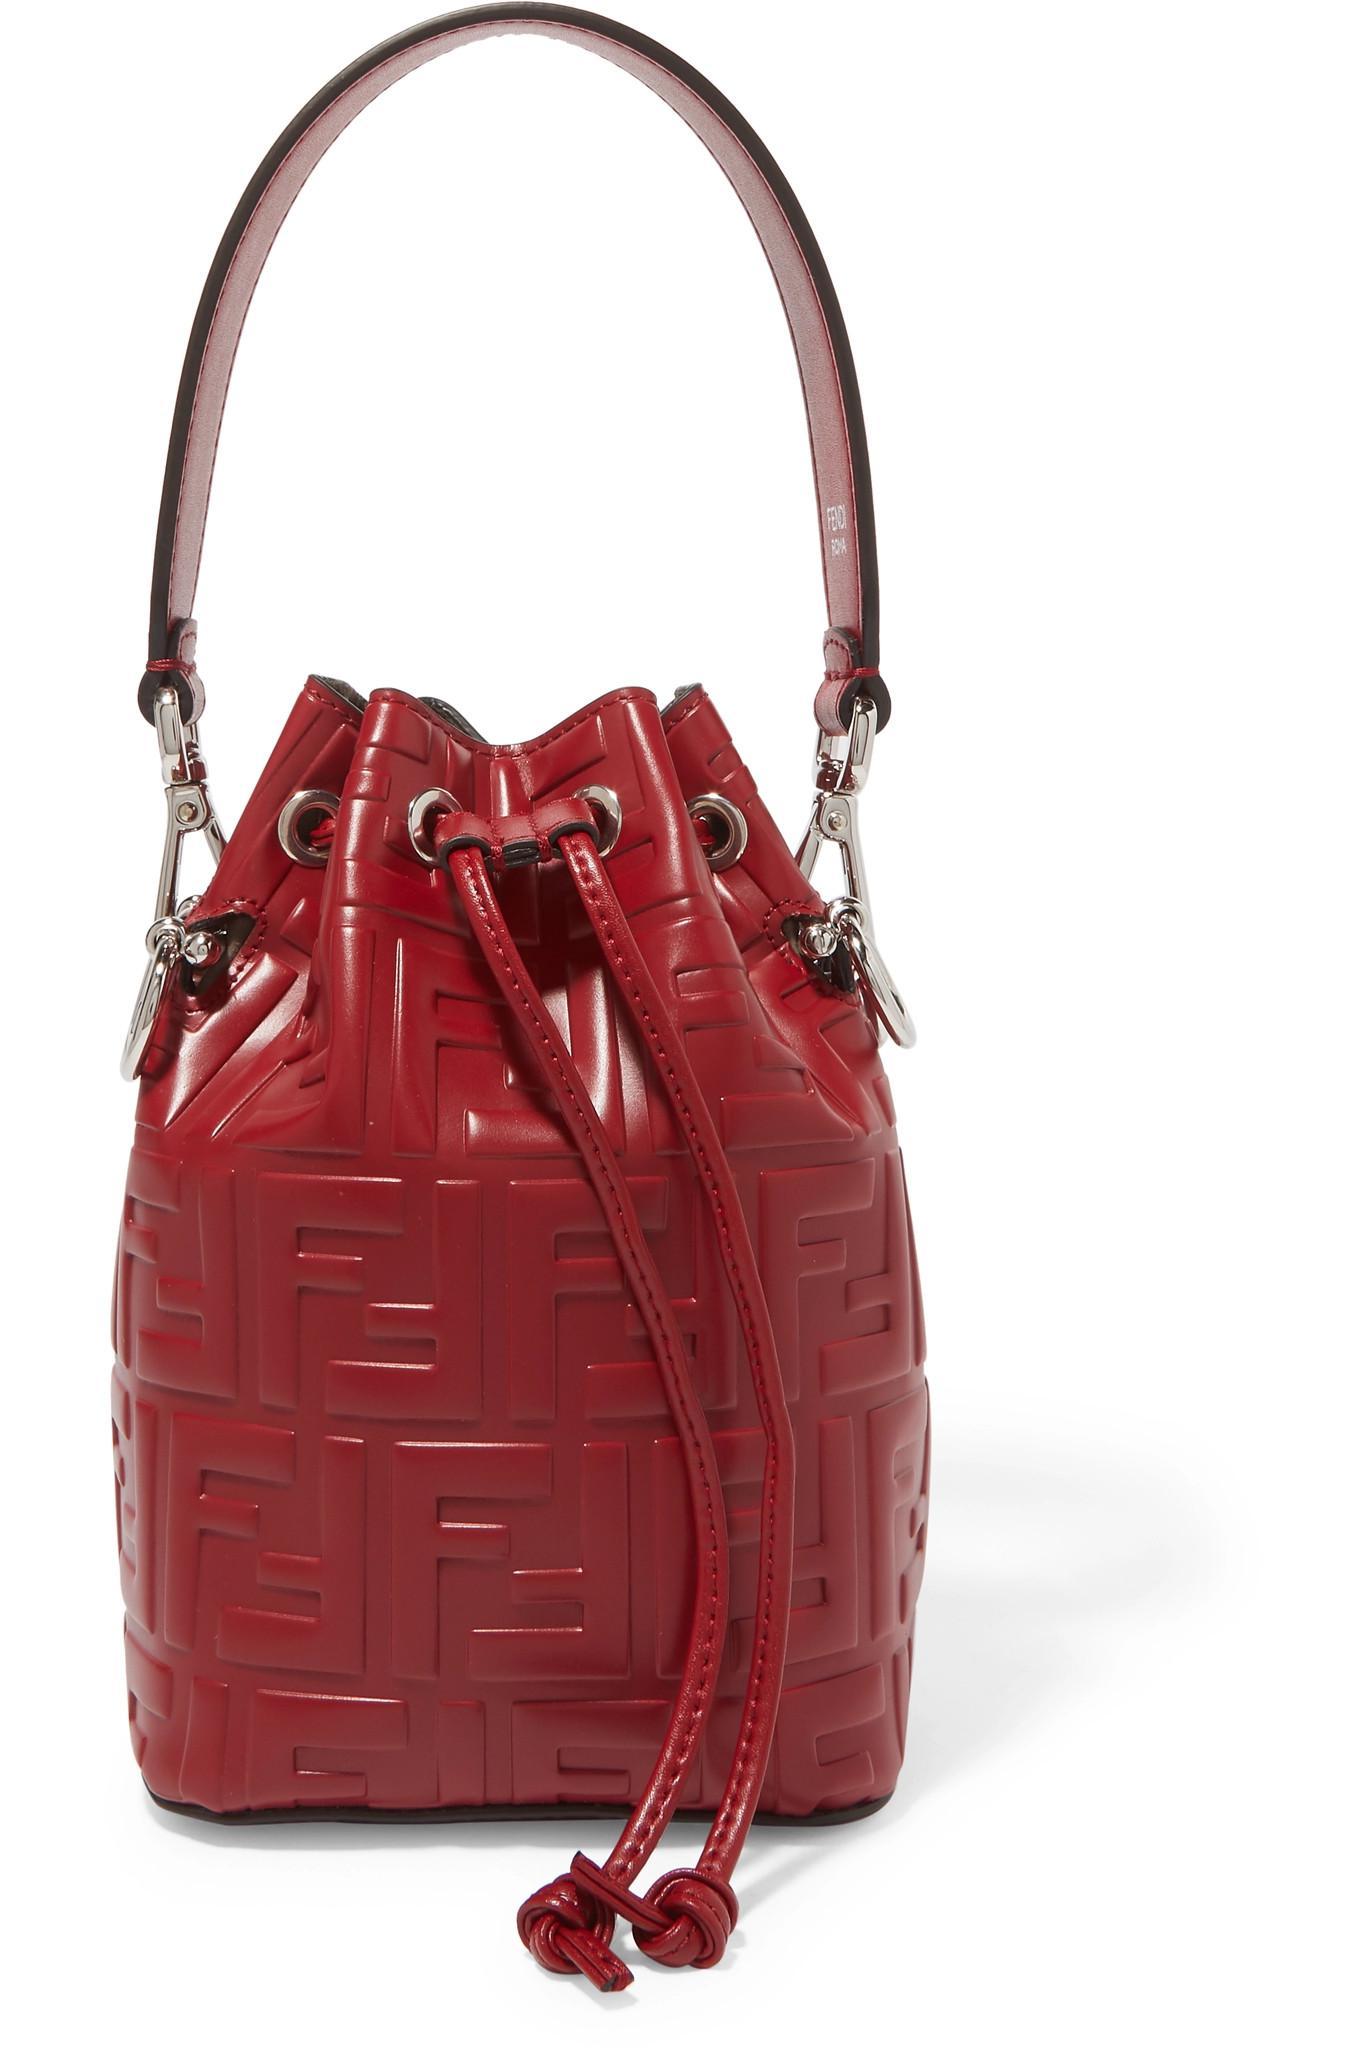 9b3b6954b6bd Fendi. Women s Mon Trésor Small Embossed Leather Bucket Bag